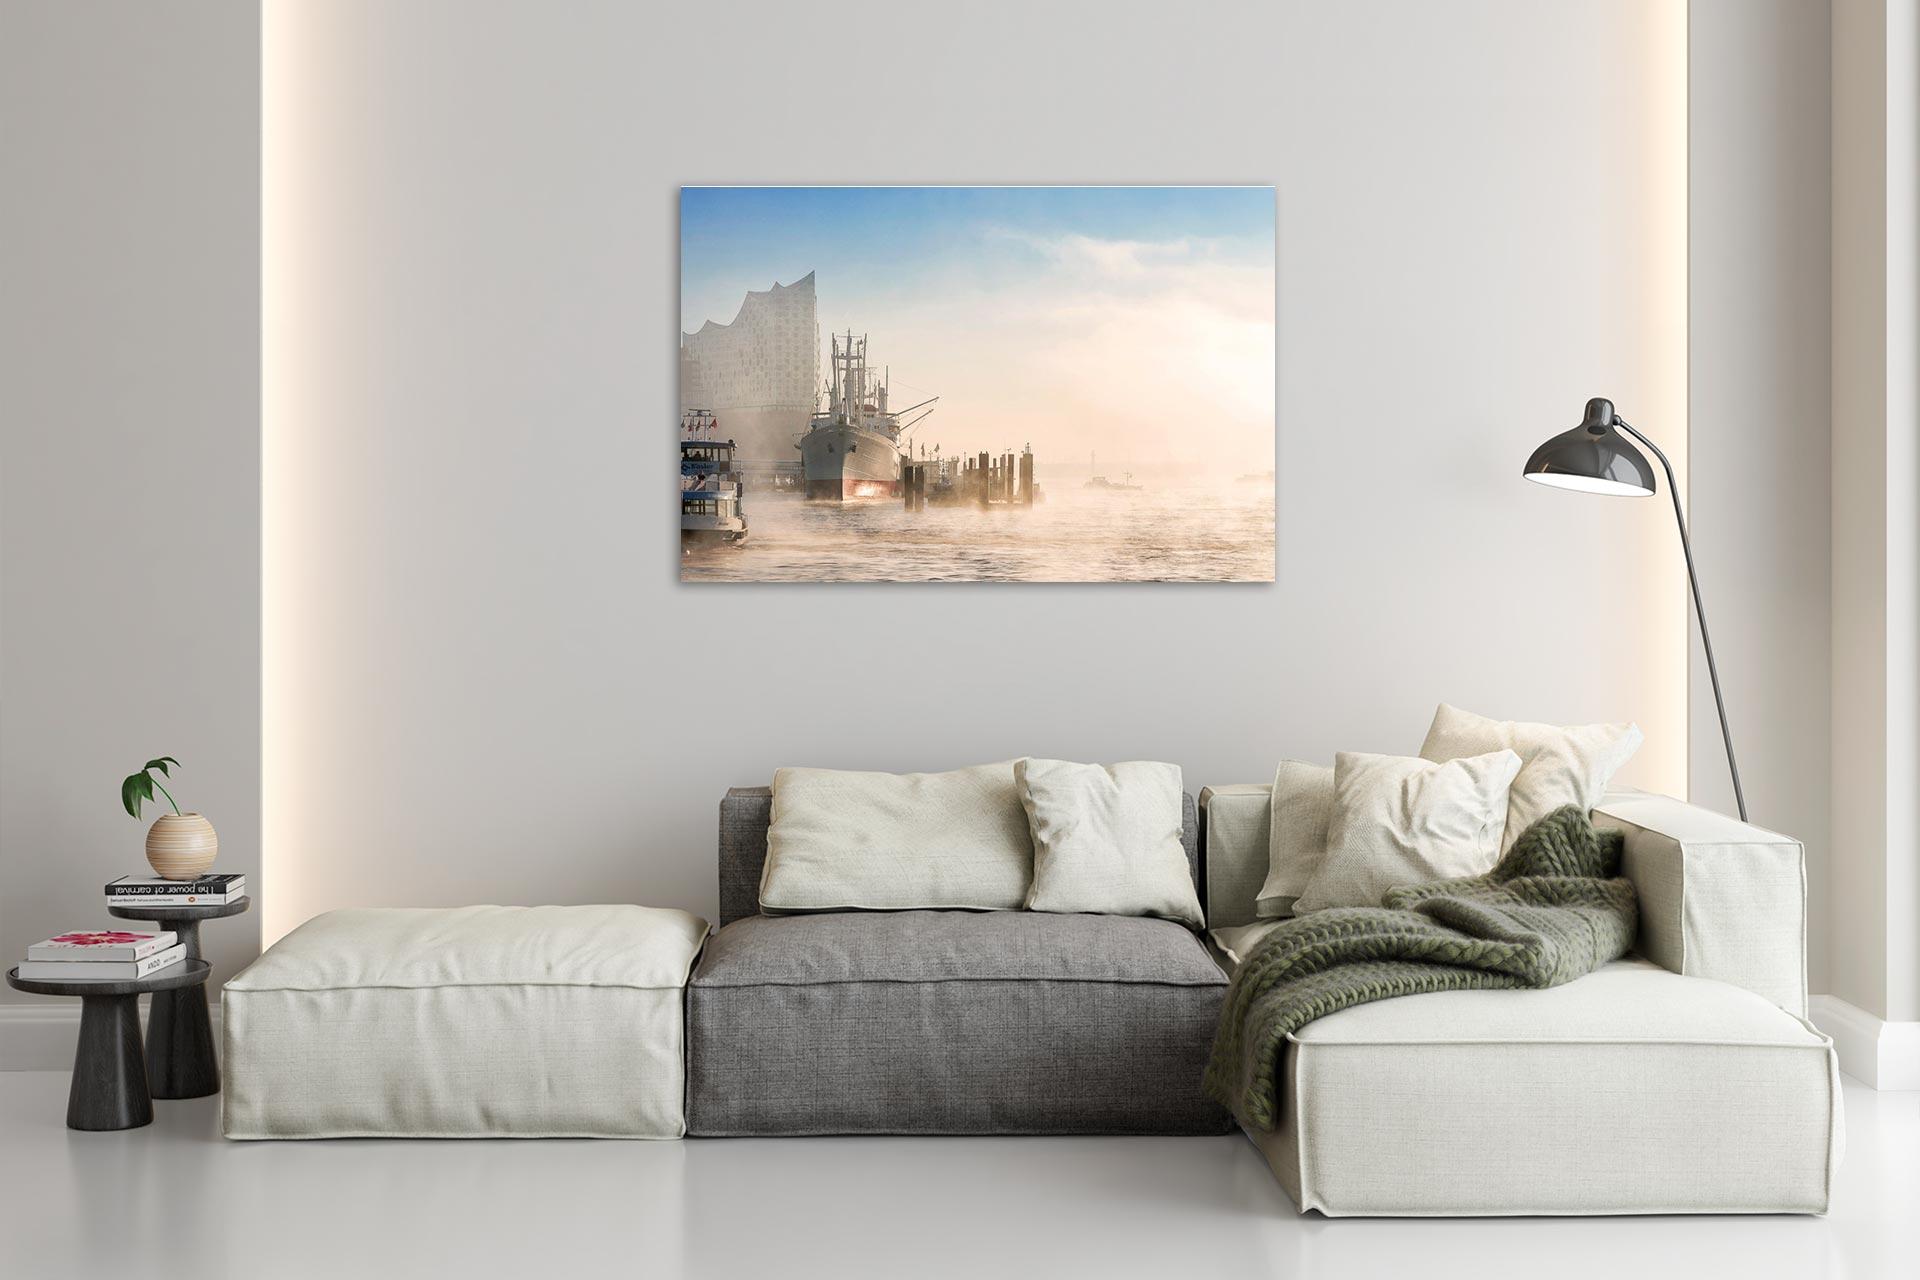 LCW247-elphi-im-nebel-hamburg-wandbild-bild-auf-leinwand-acrylglas-aludibond-wohnzimmer